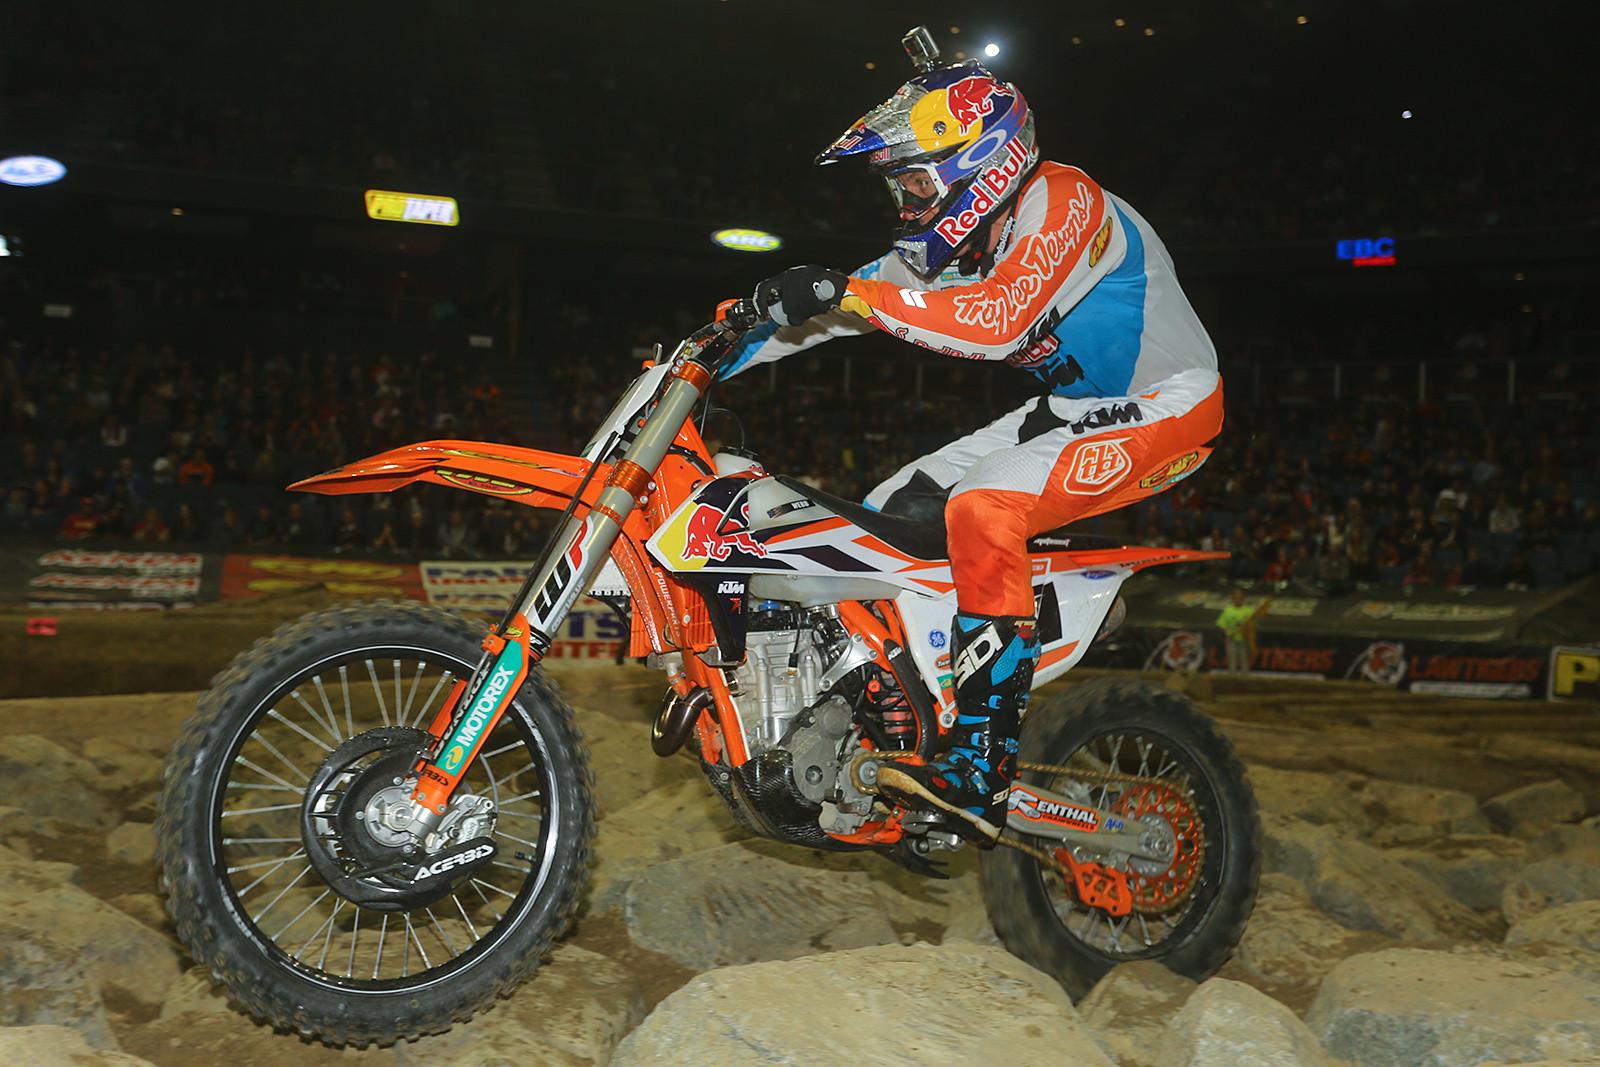 Cody Webb - Endurocross Finals - Motocross Pictures - Vital MX